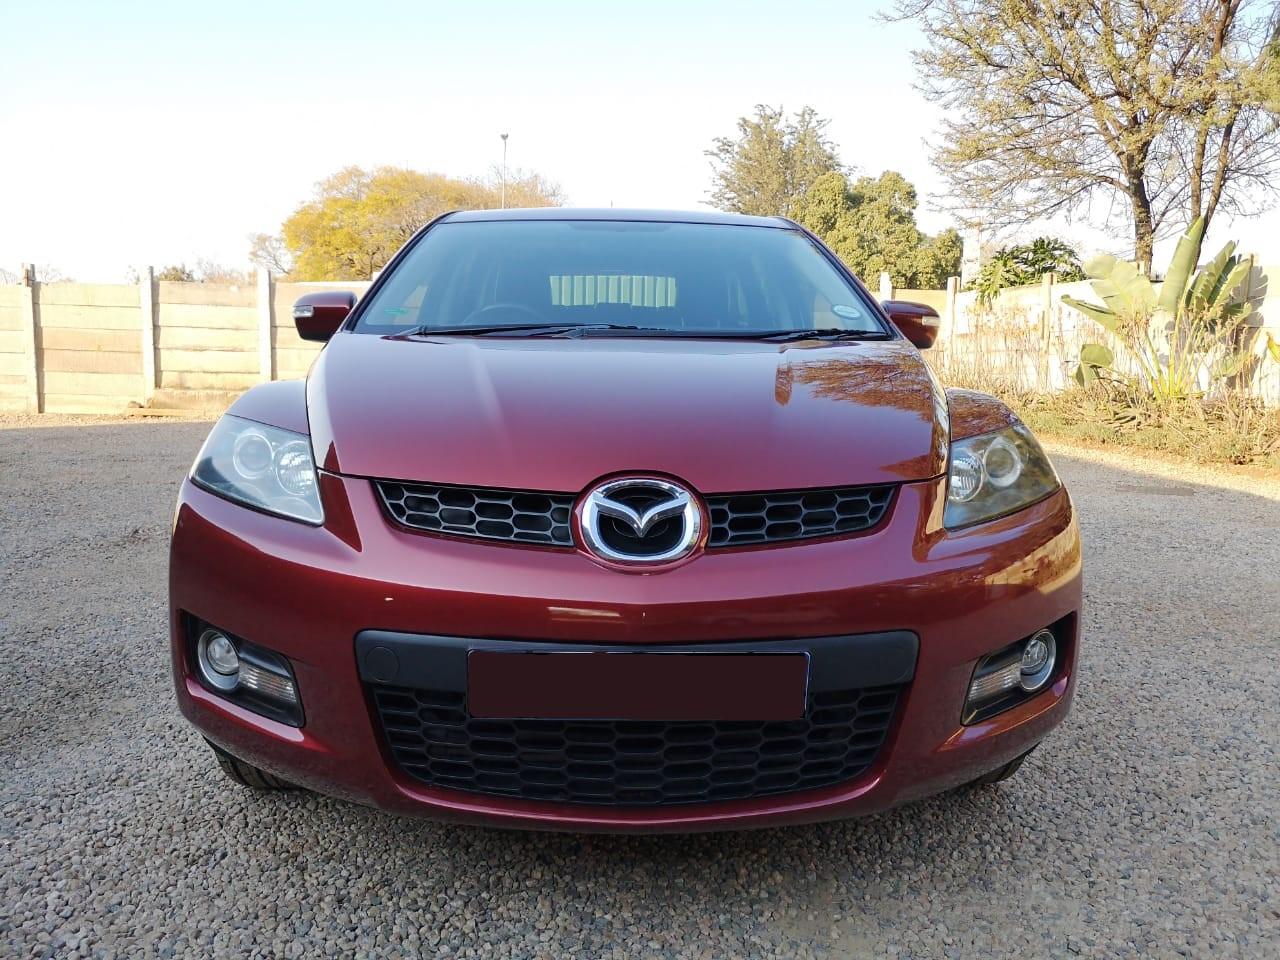 2009 Mazda CX-7 2.3T